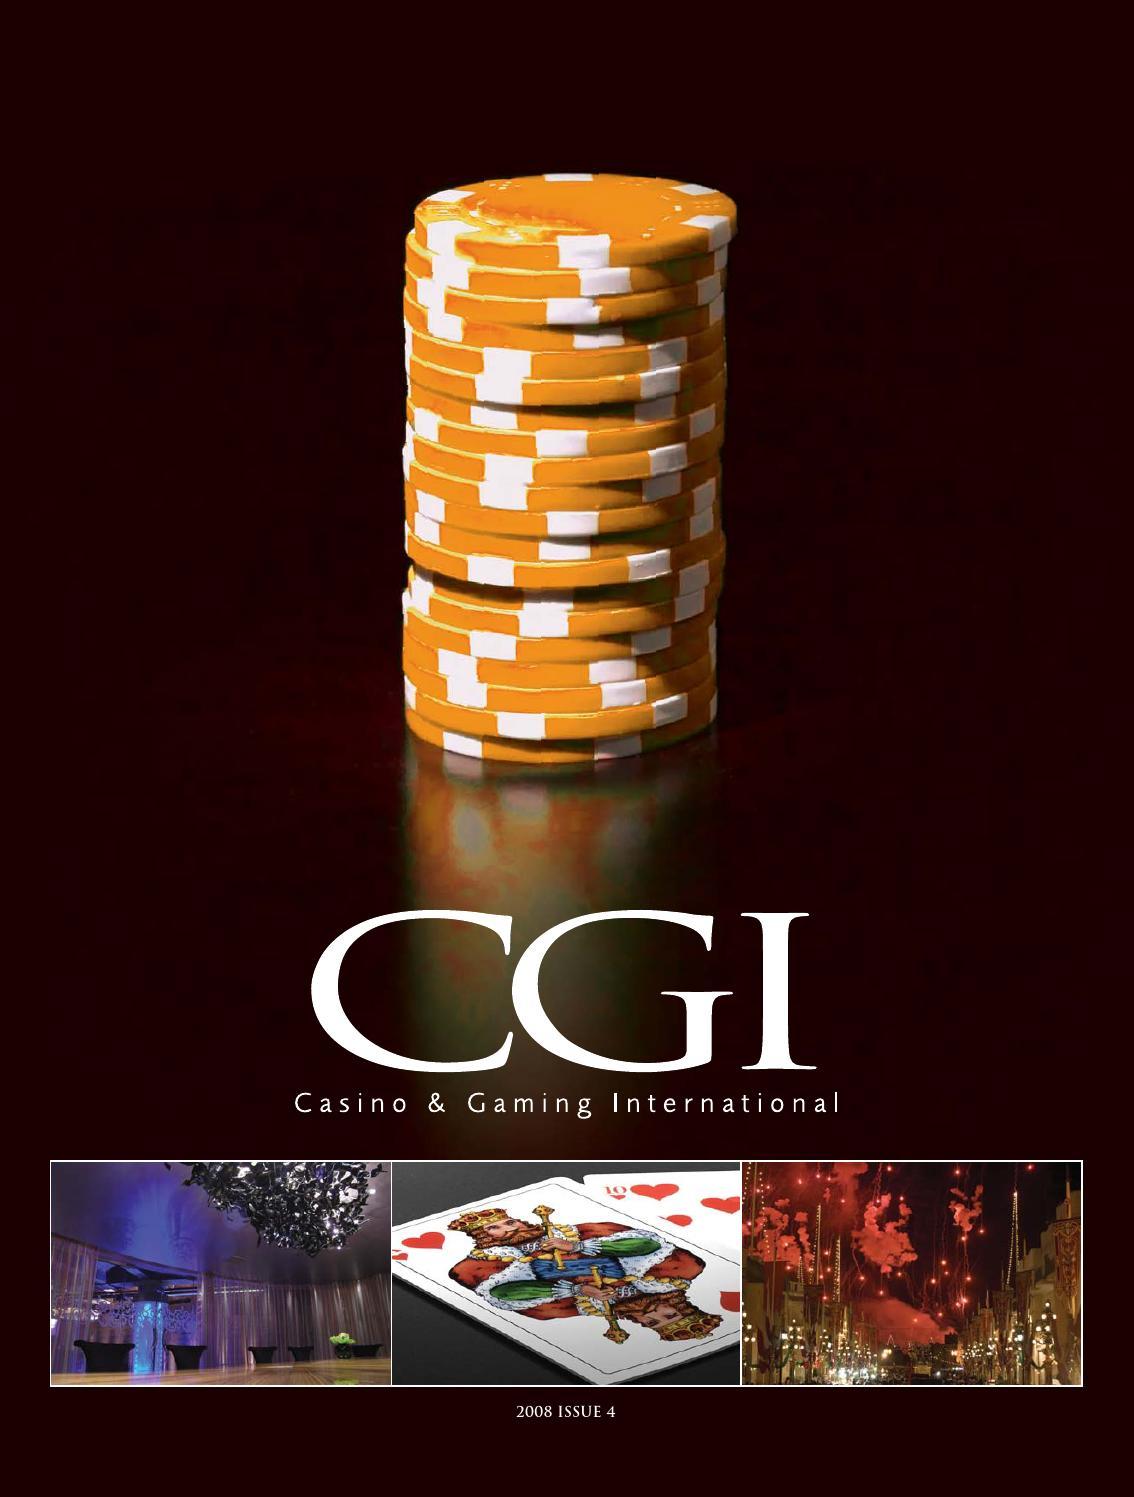 Casino eastern europe gambling religion s.net travel online casinos usa mac